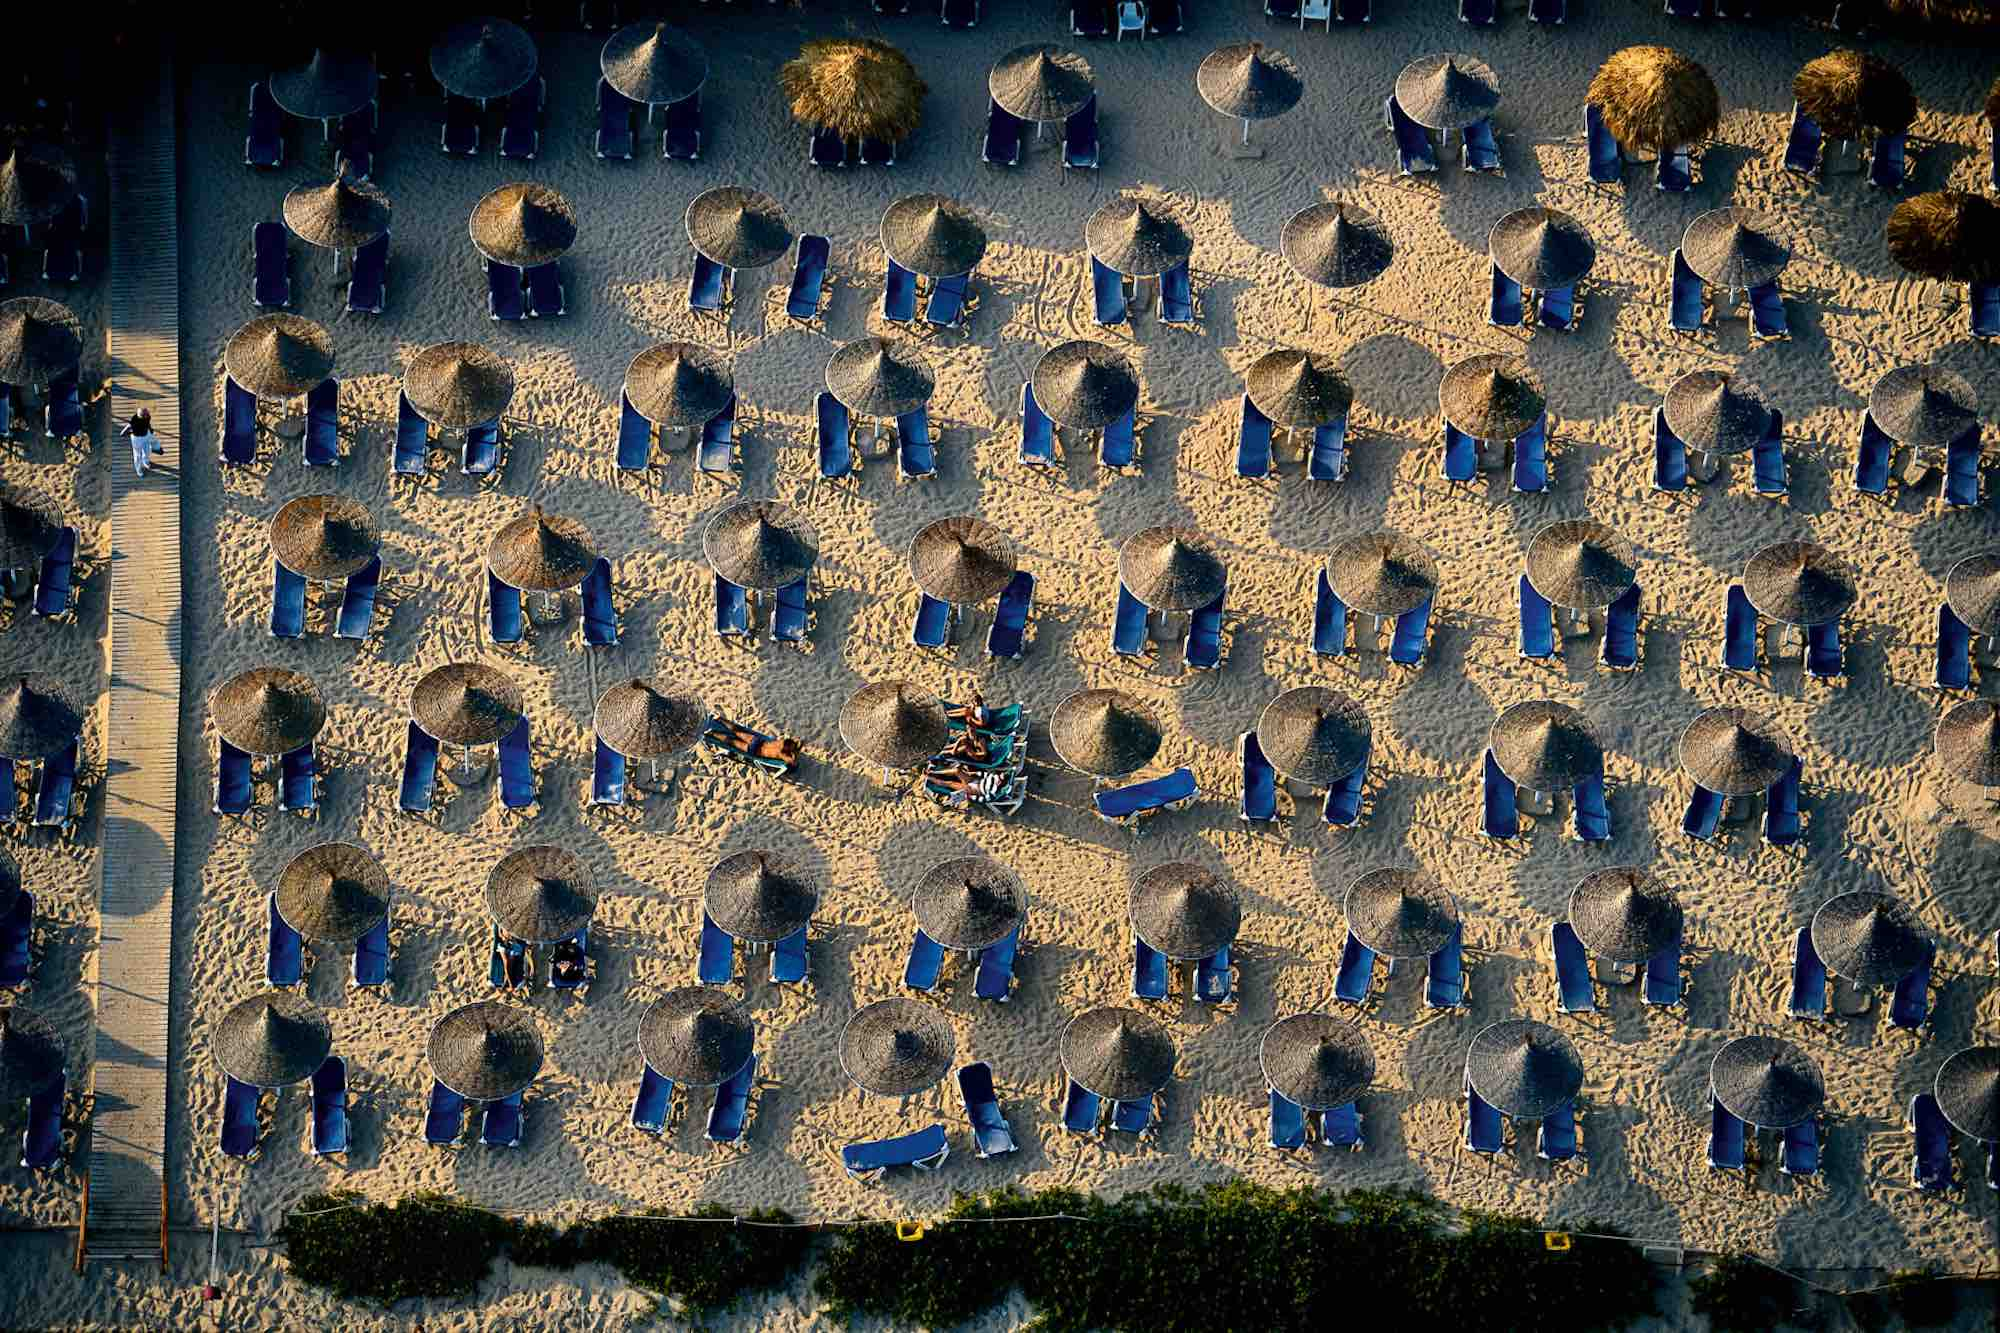 Umbrellas - Yann Arthus-Bertrand